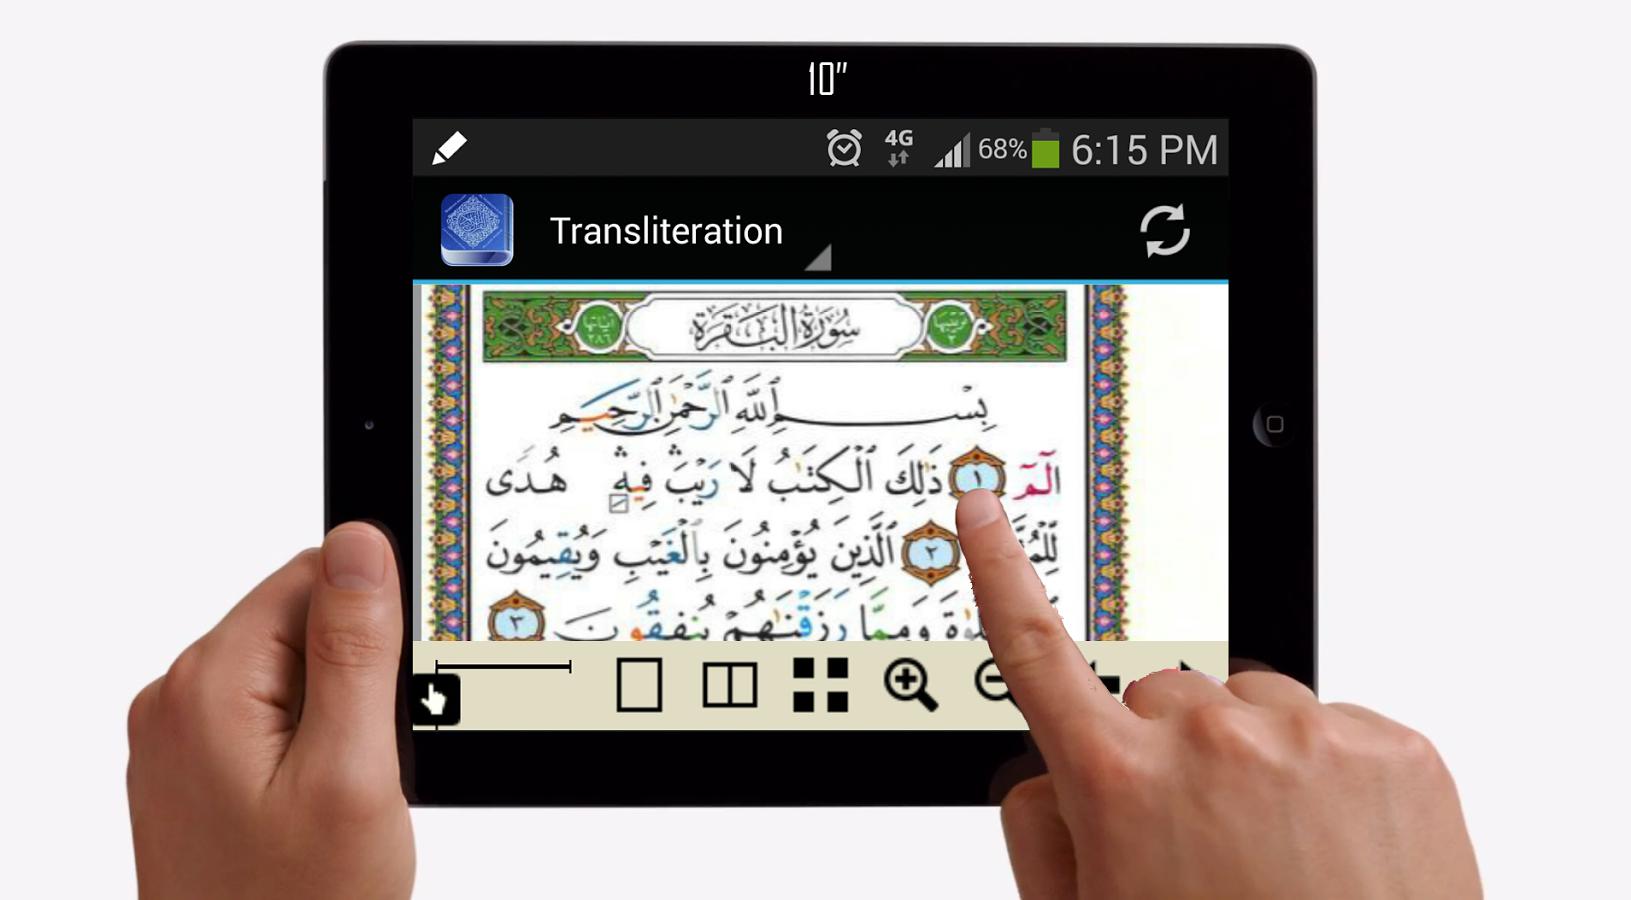 Quran-reading Apps Growing in Popularity - International Shia News